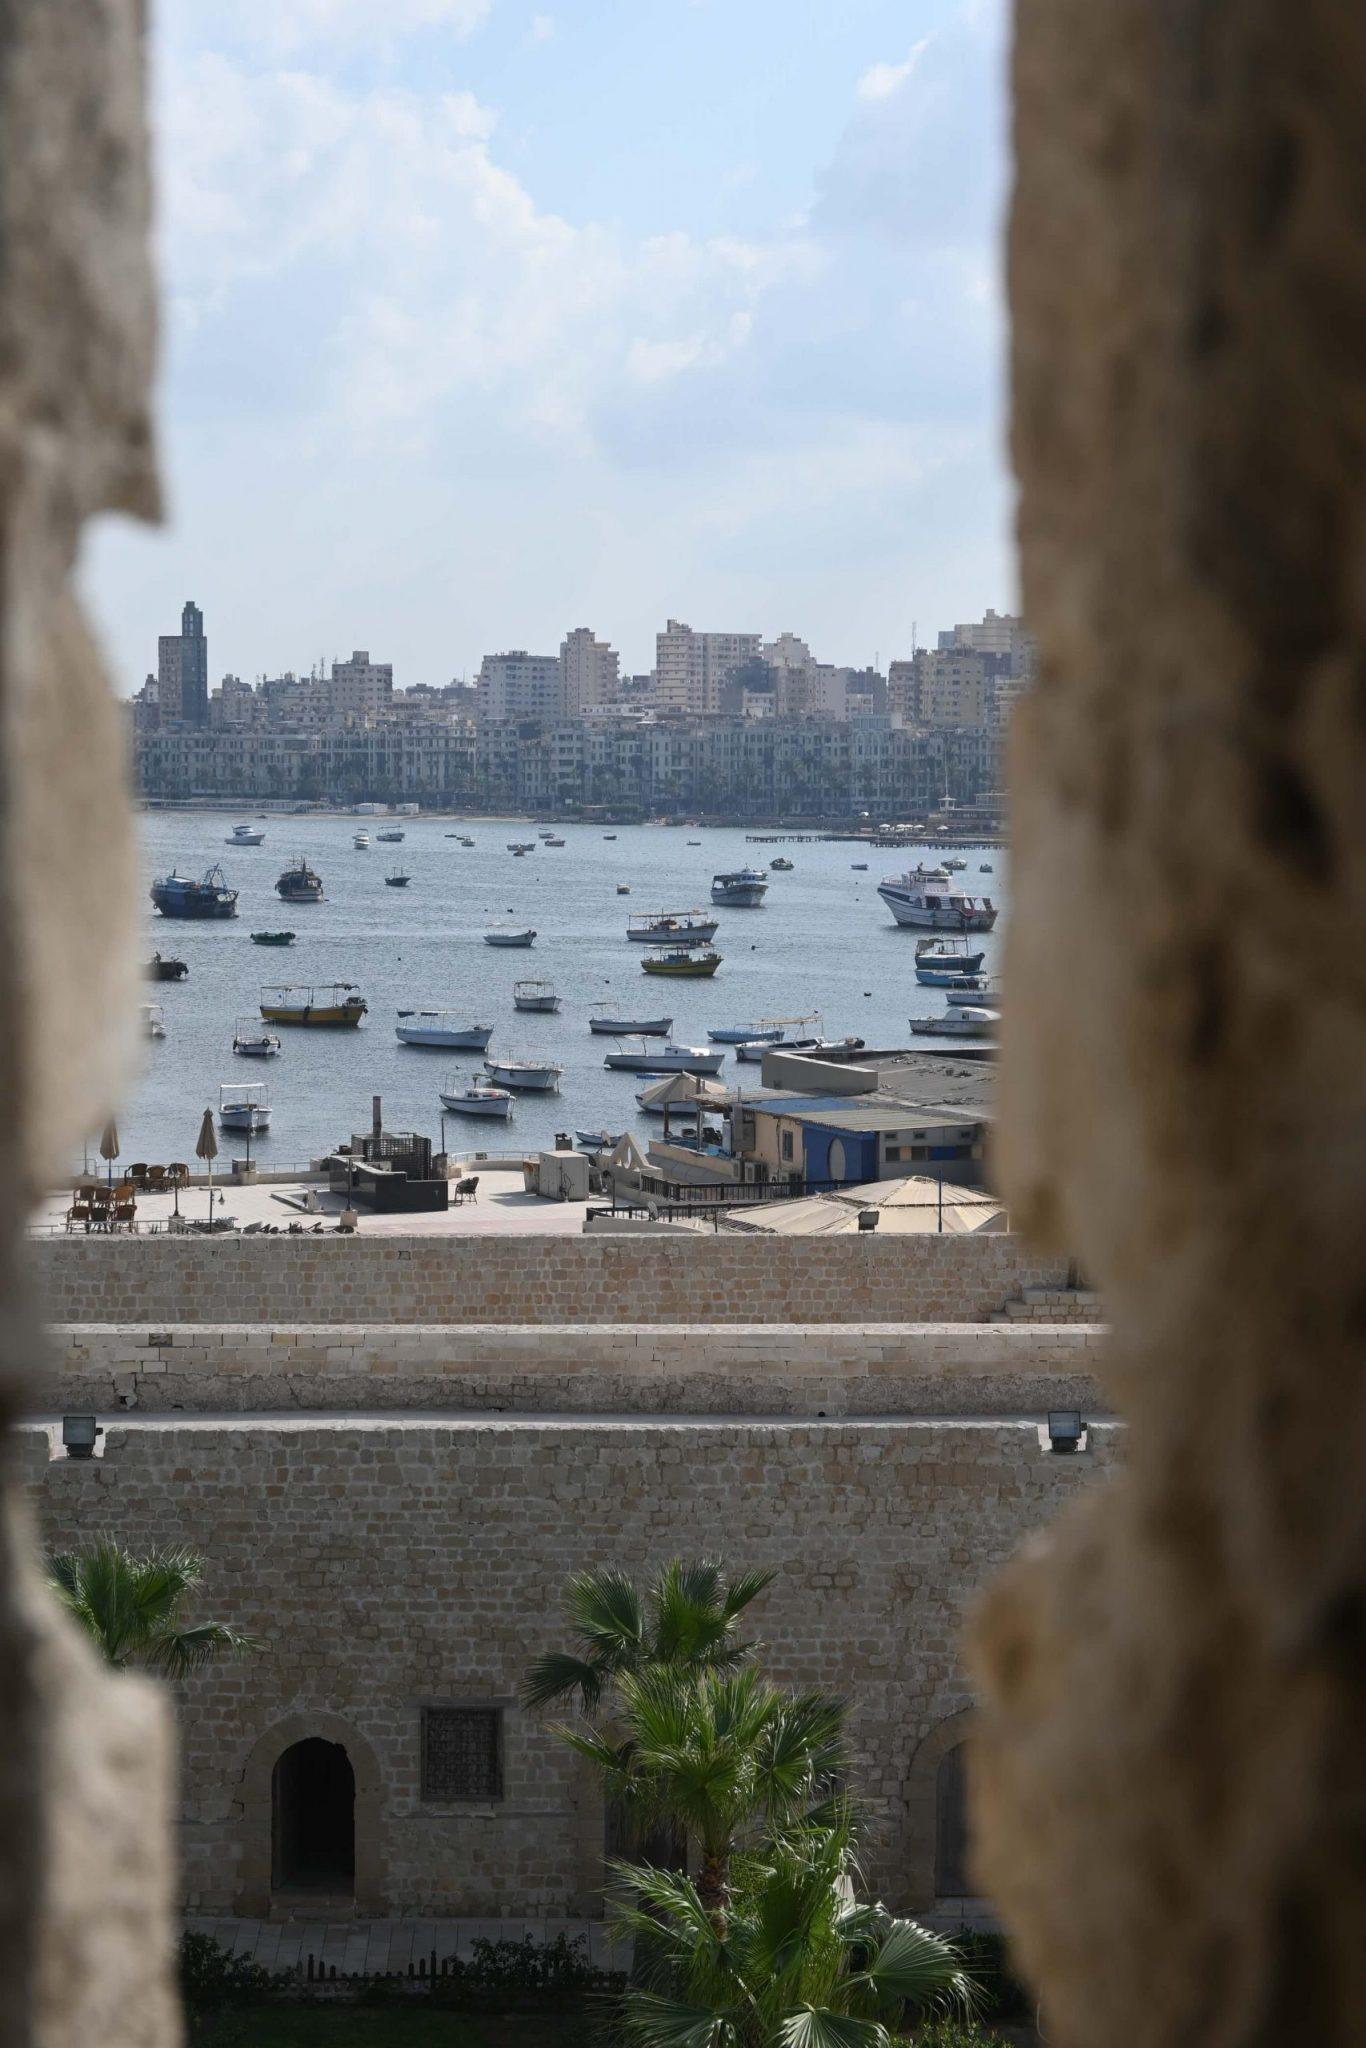 Citadel of Qaitbay قلعه قايتباي بالاسكندريه